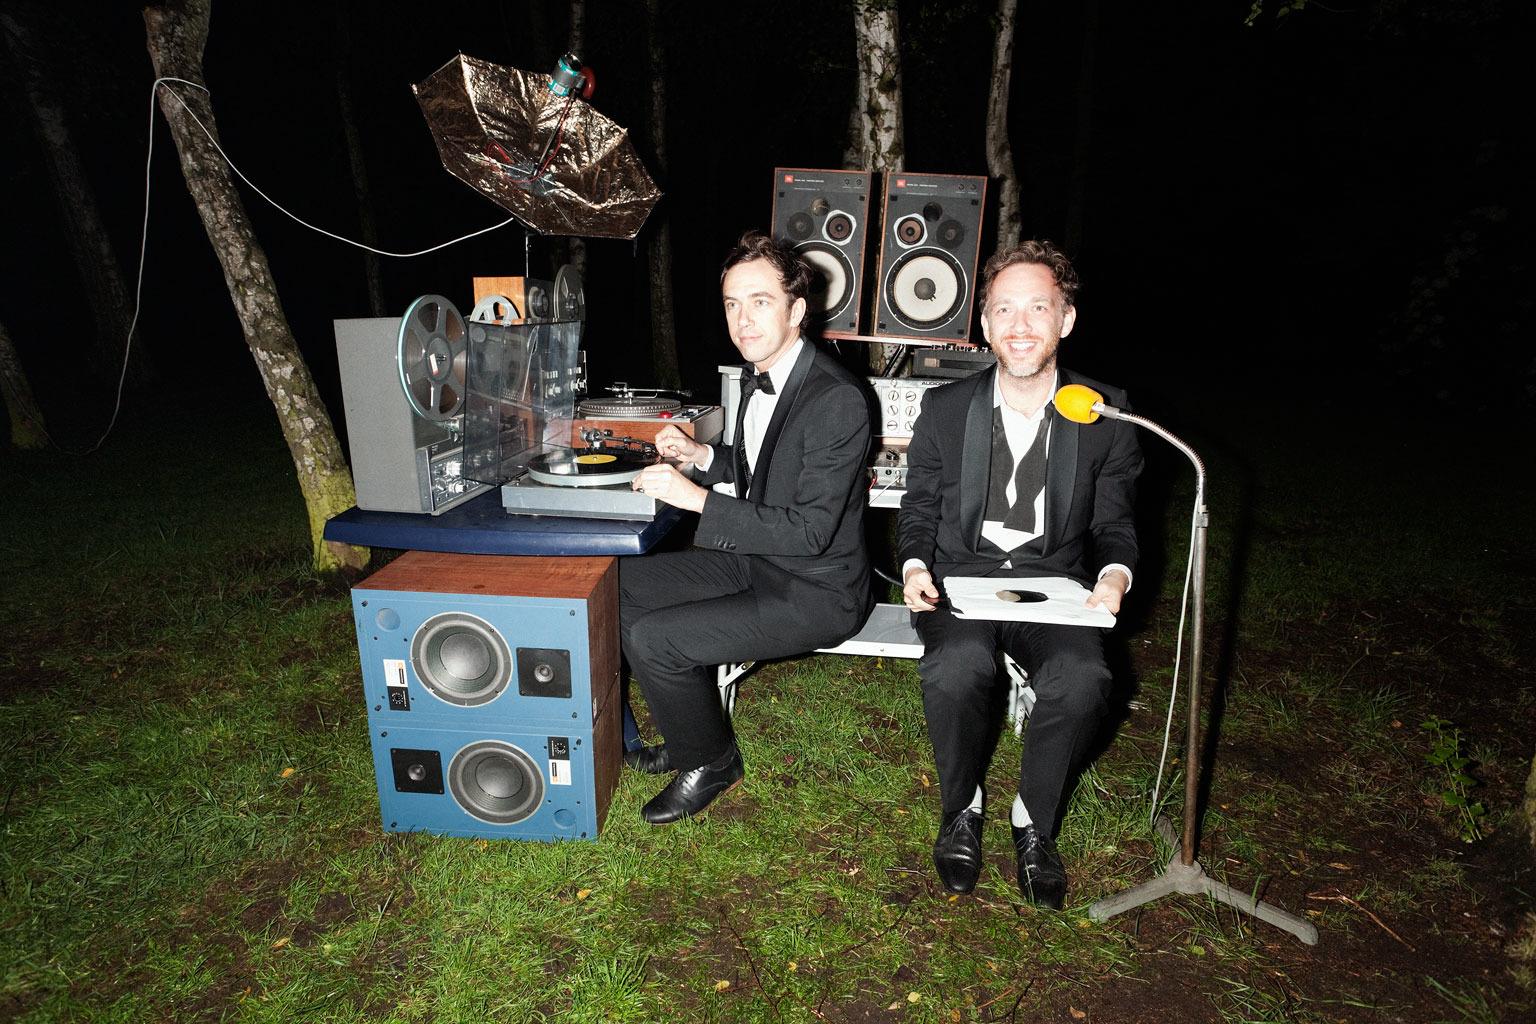 Razz Clubs: 2ManyDJs + Max Cooper + Marco Passarani